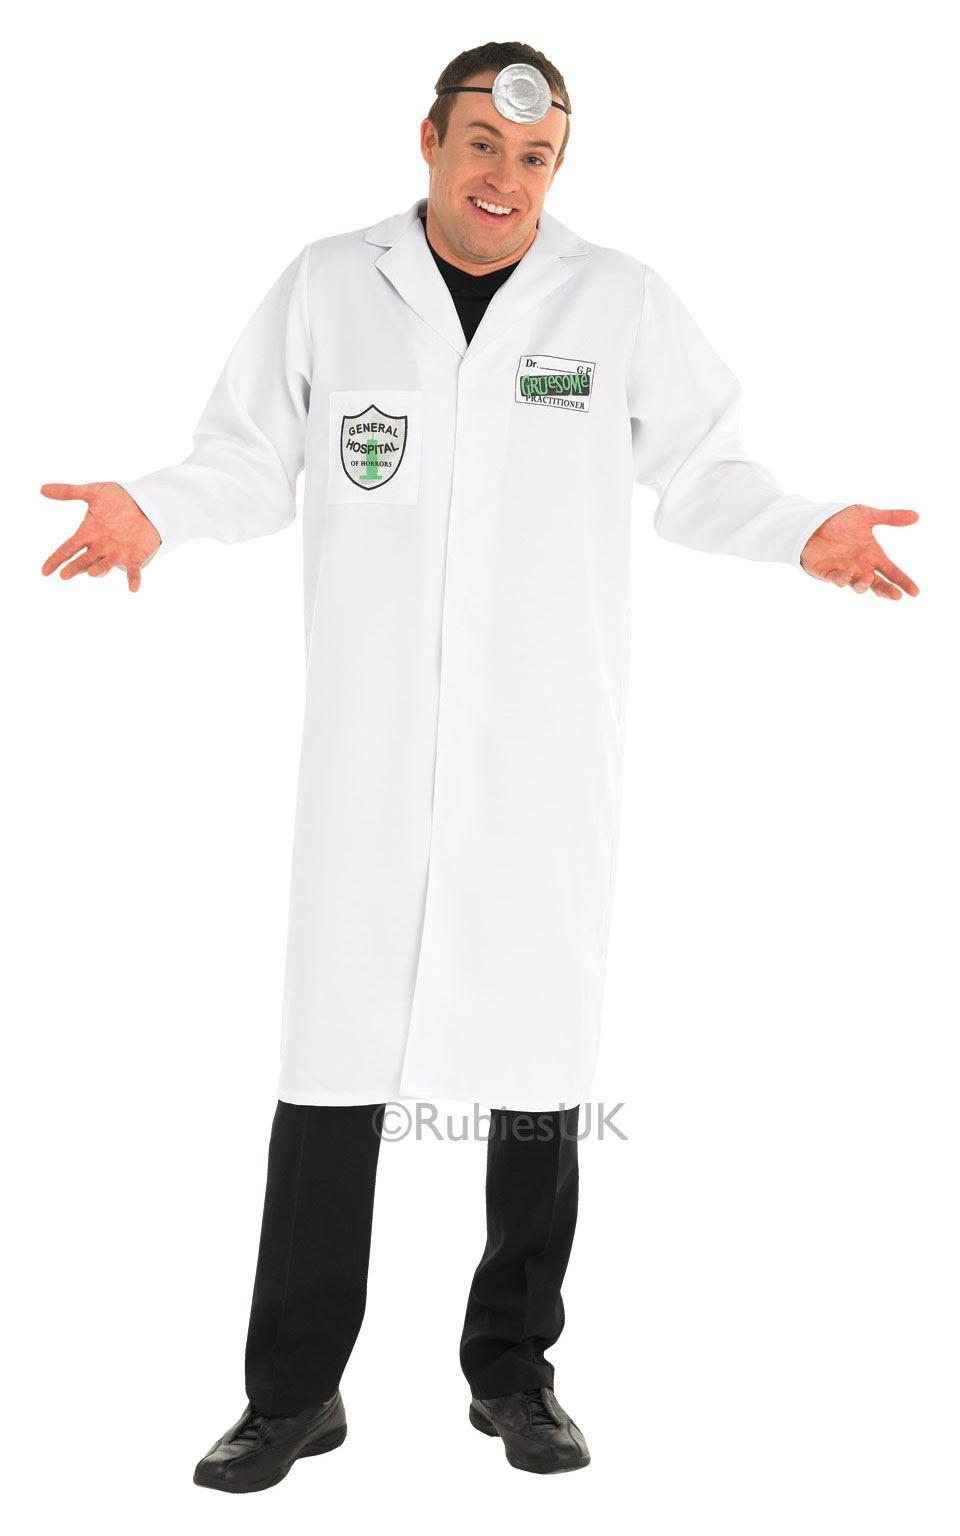 Mens-Gruesome-GP-Hospital-Doctor-Costume-Halloween-Fancy-  sc 1 st  eBay & Mens Gruesome GP Hospital Doctor Costume Halloween Fancy Dress ...